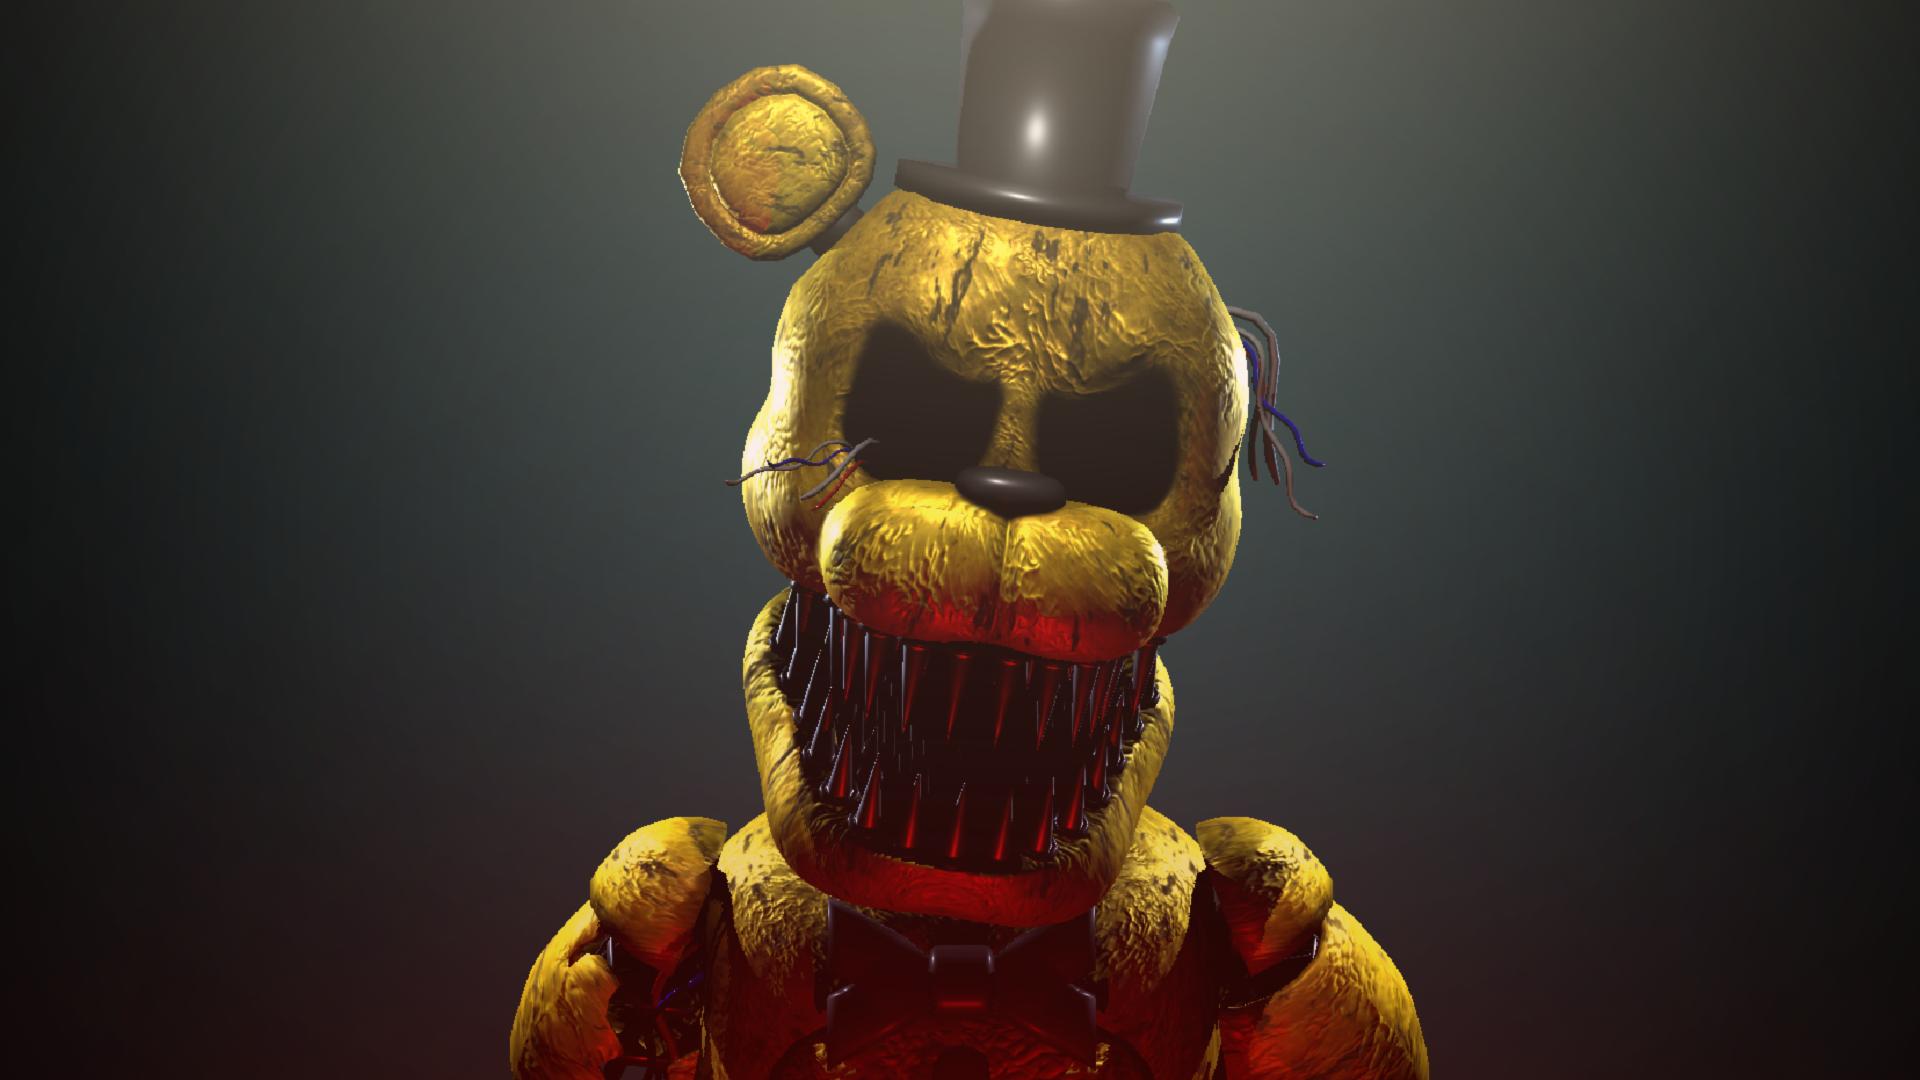 Sinister Golden Freddy Official Sinister Turmoil Wikia